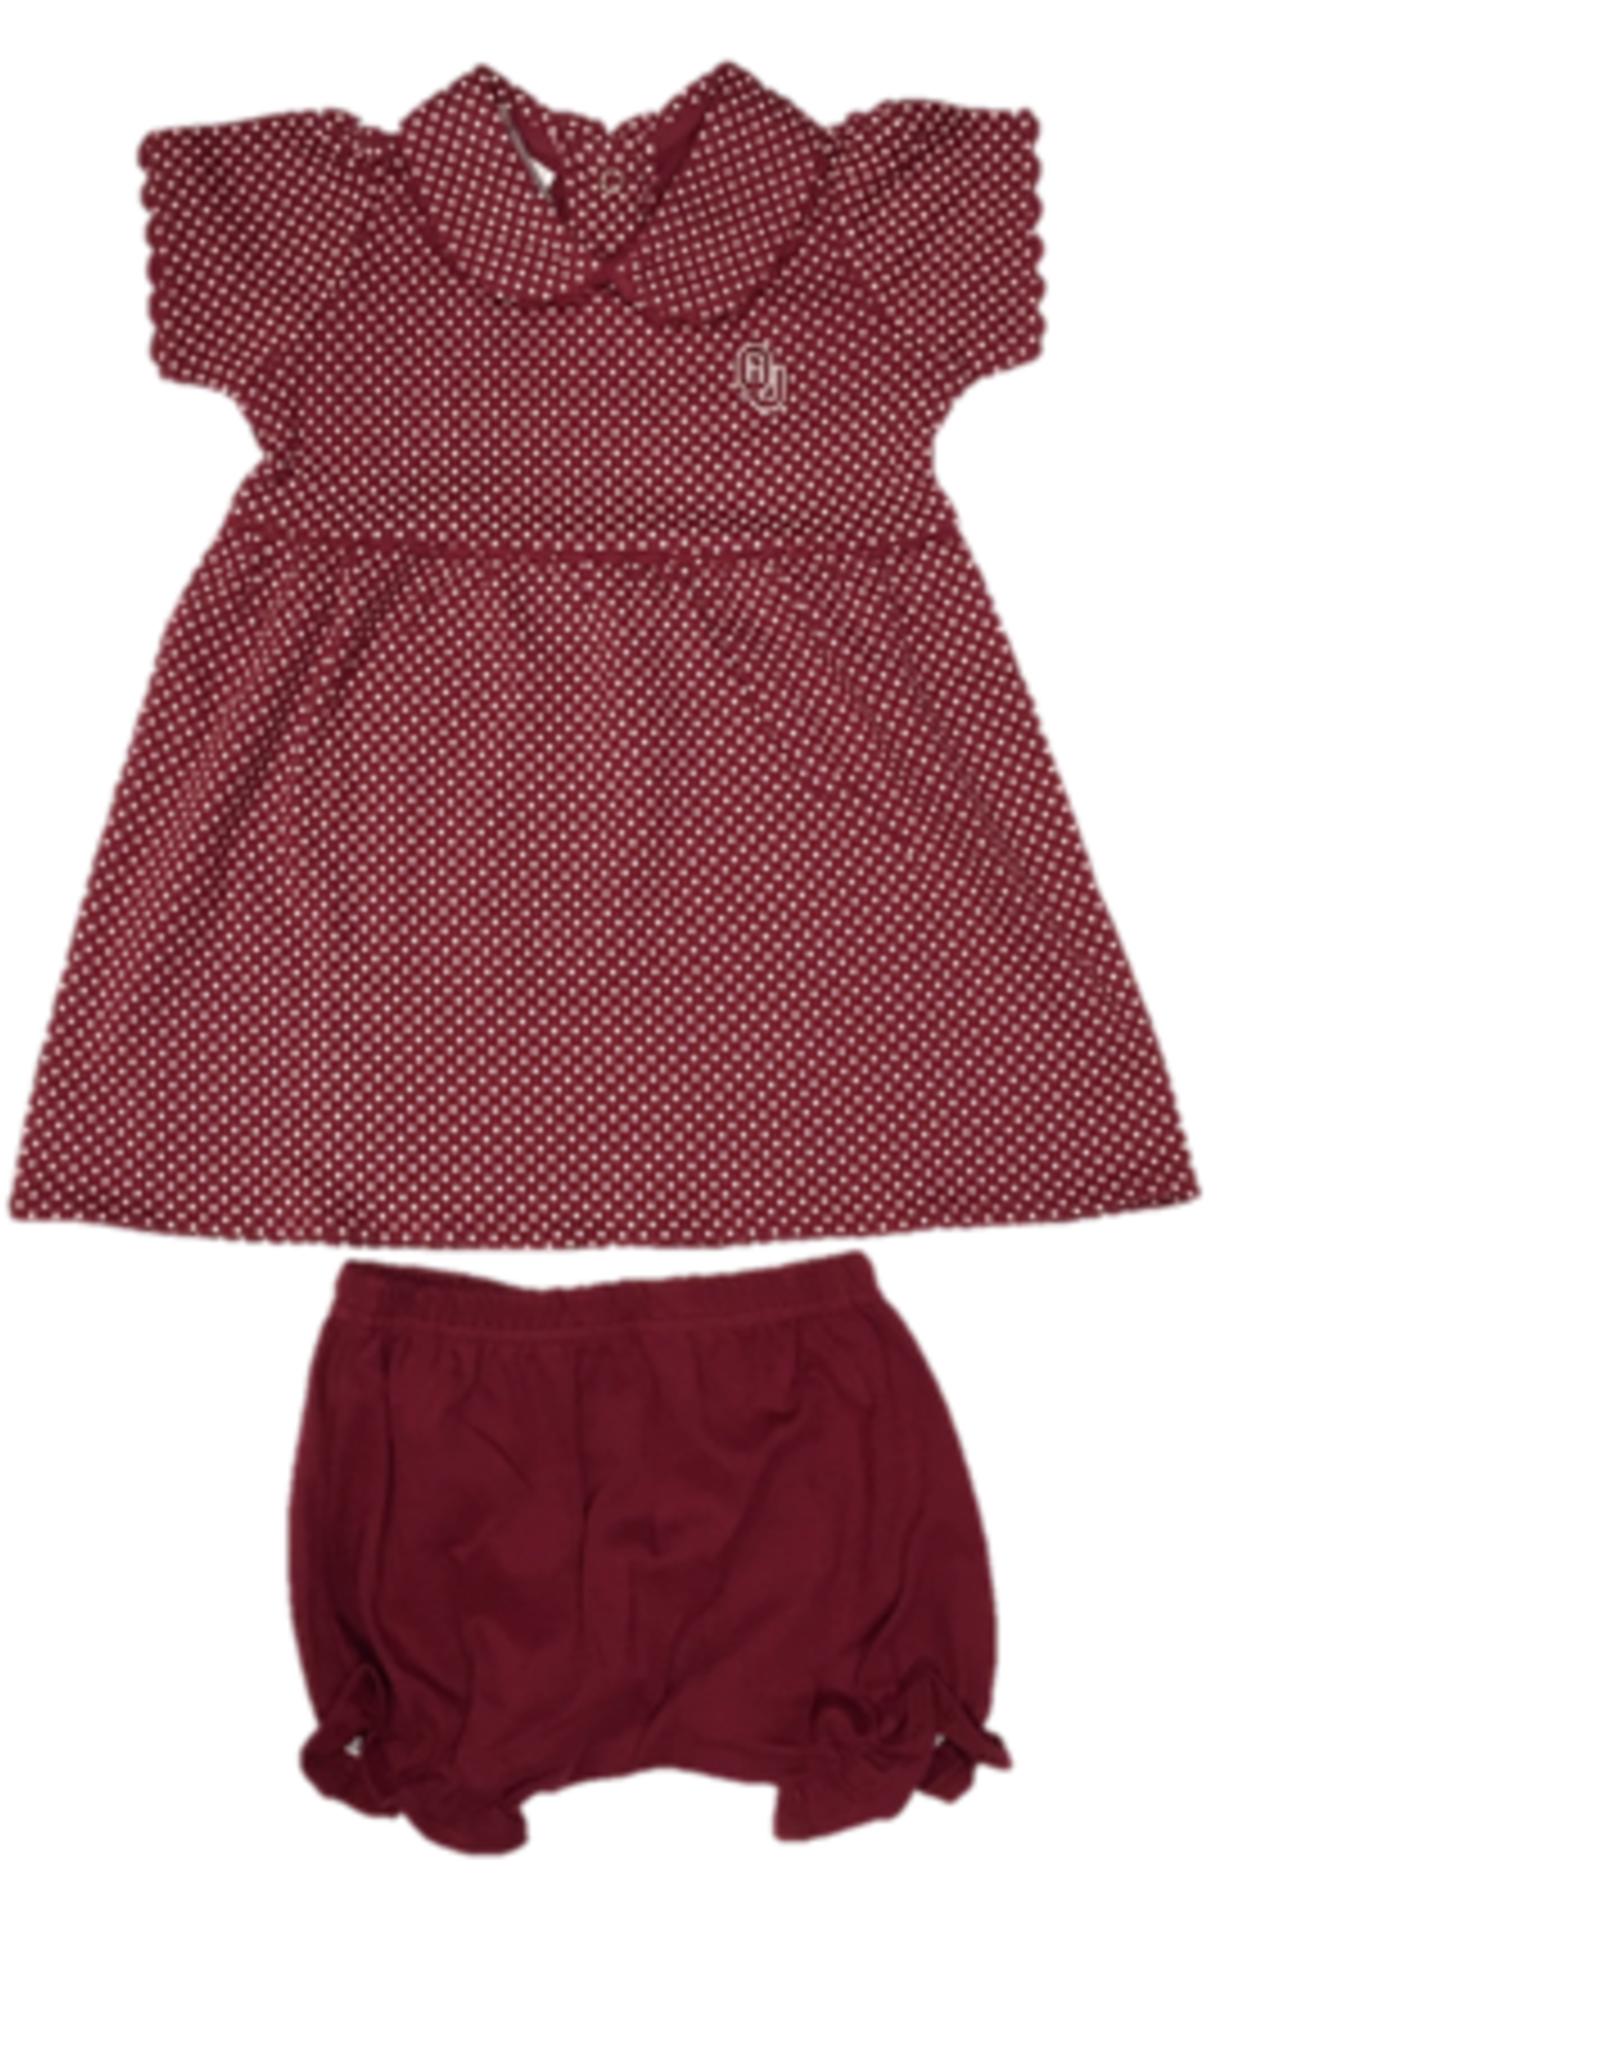 Two Feet Ahead Infant OU Peter Pan Dress